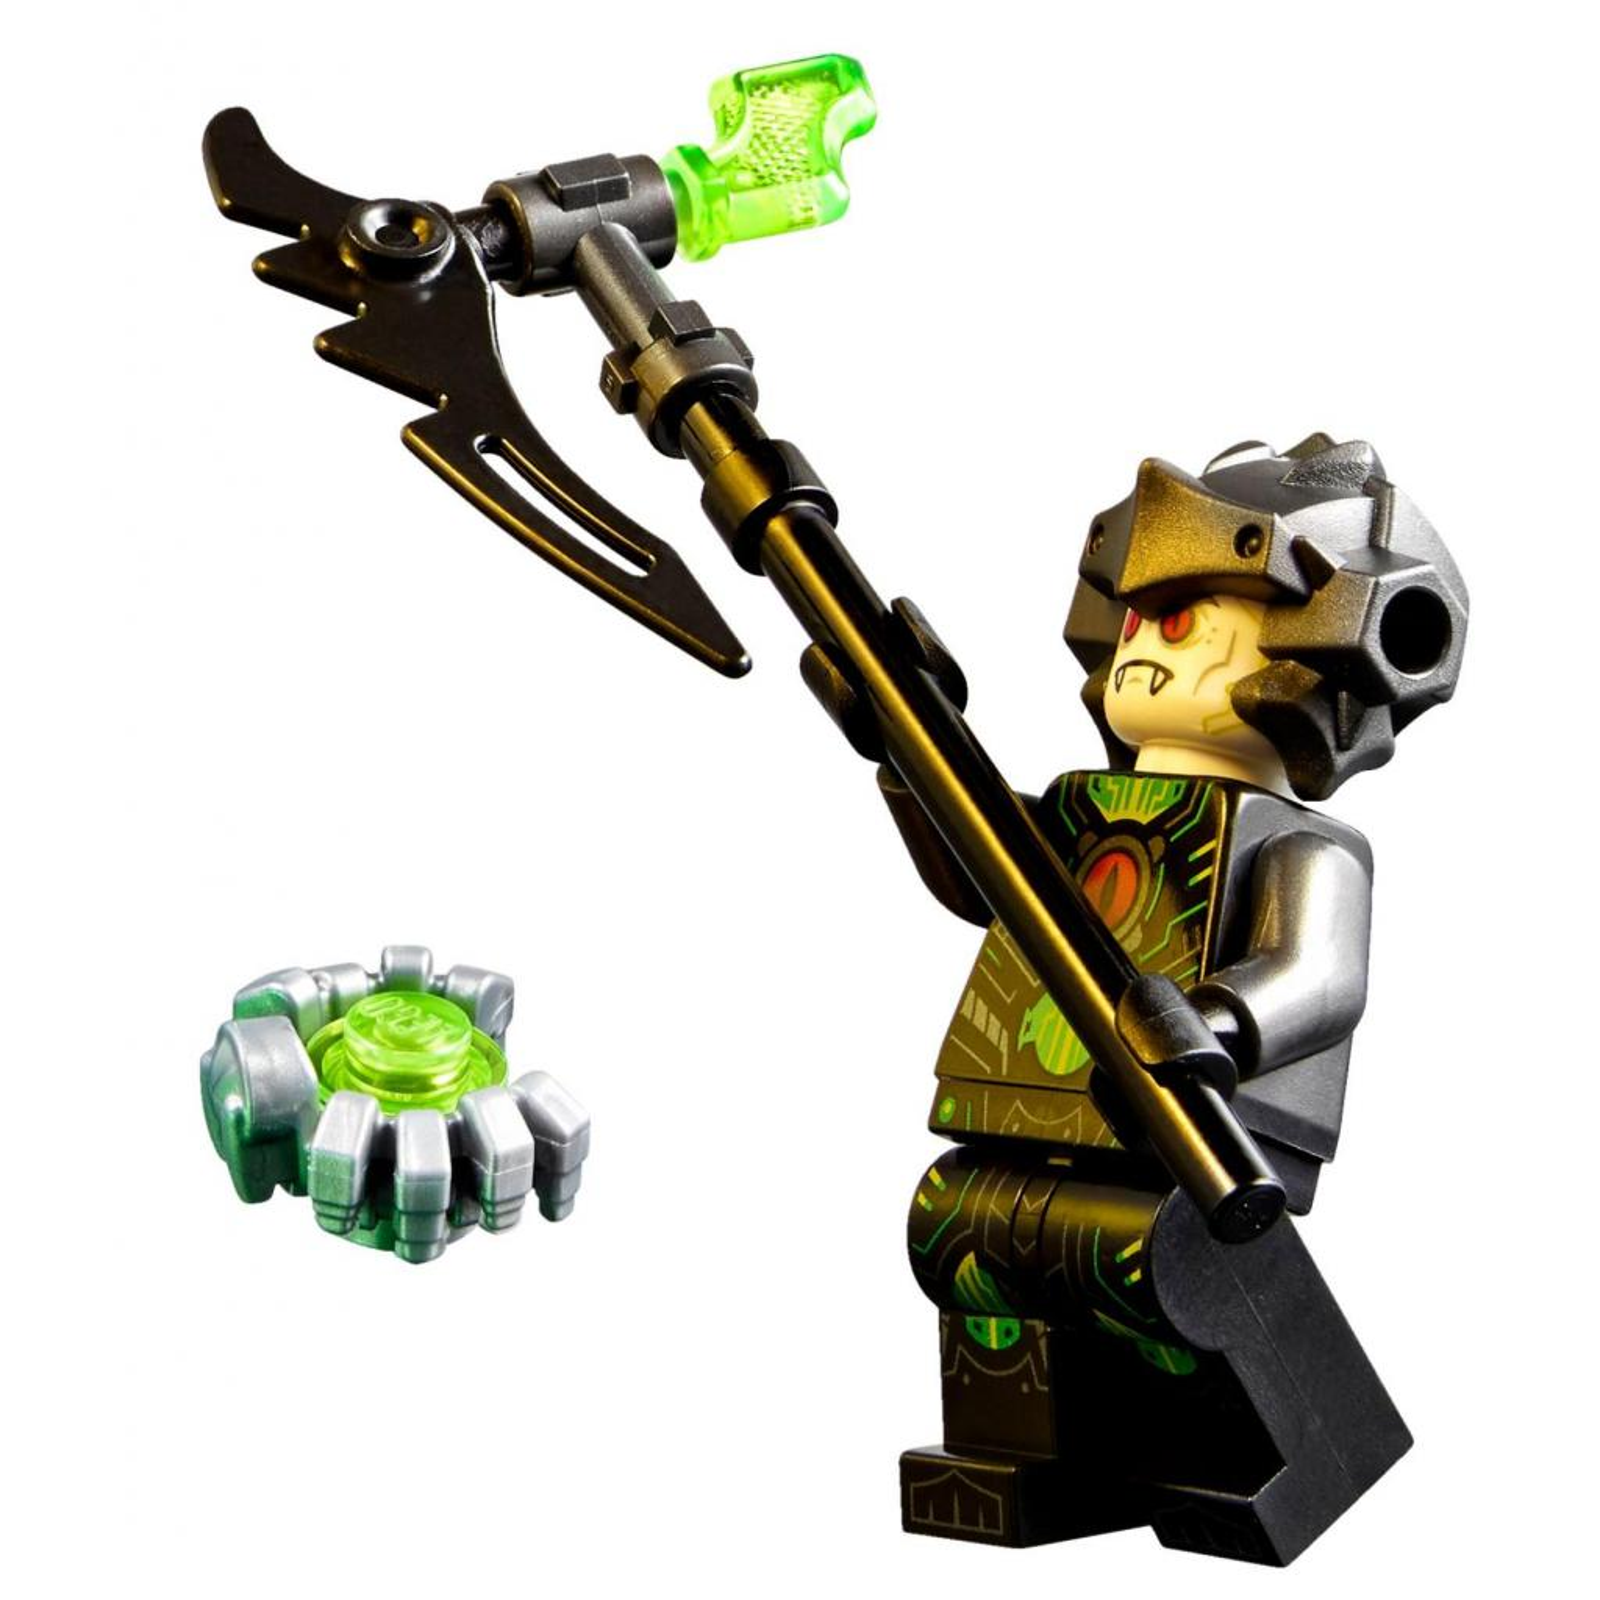 Конструктор LEGO Nexo Knights Бой техномагов (72004) изображение 7